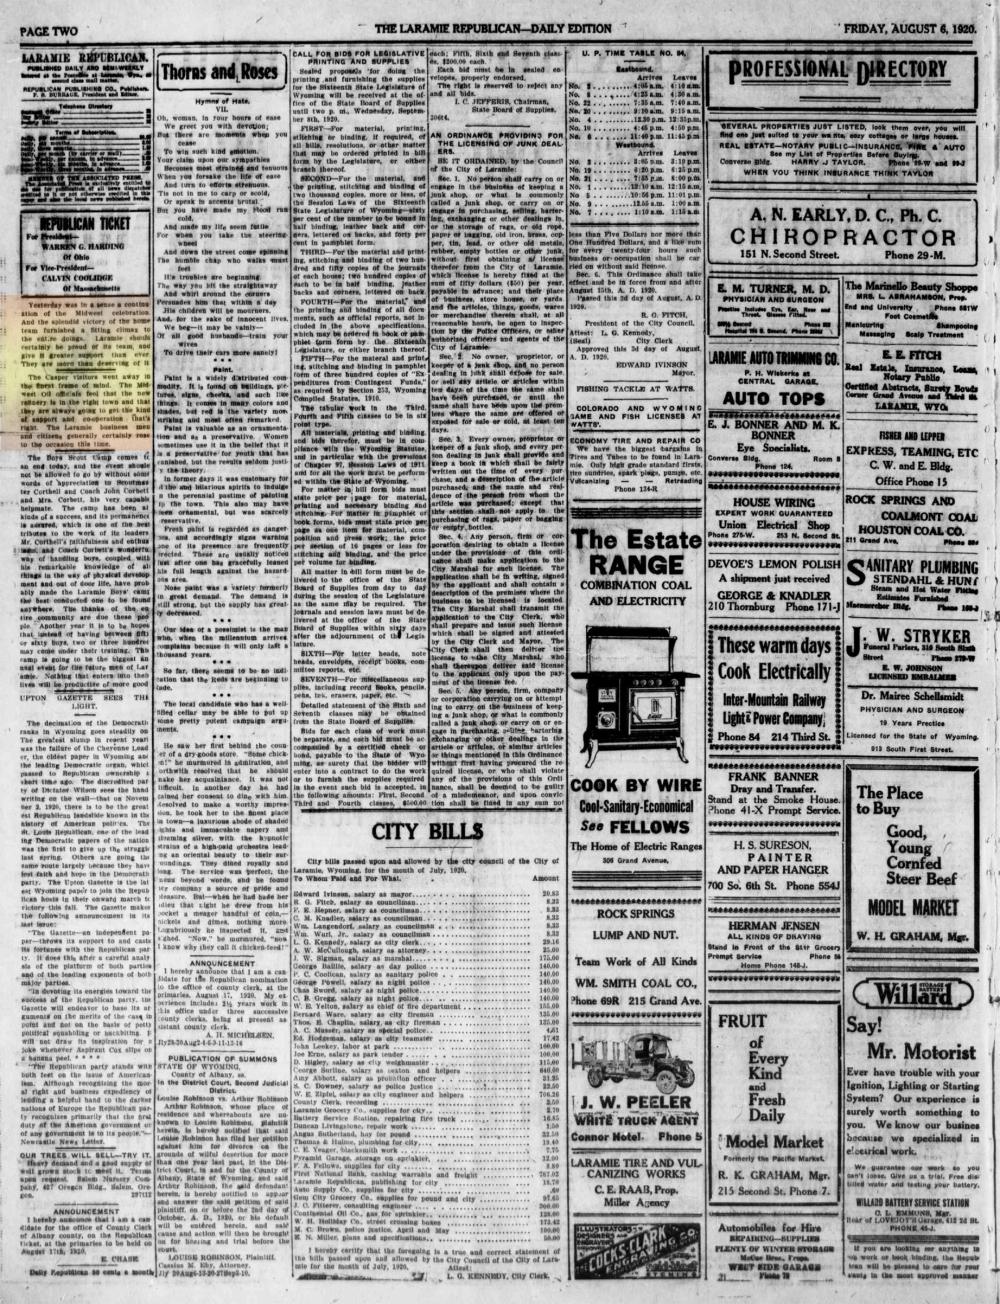 Laramie Republican 6thAugust1920, page 2.